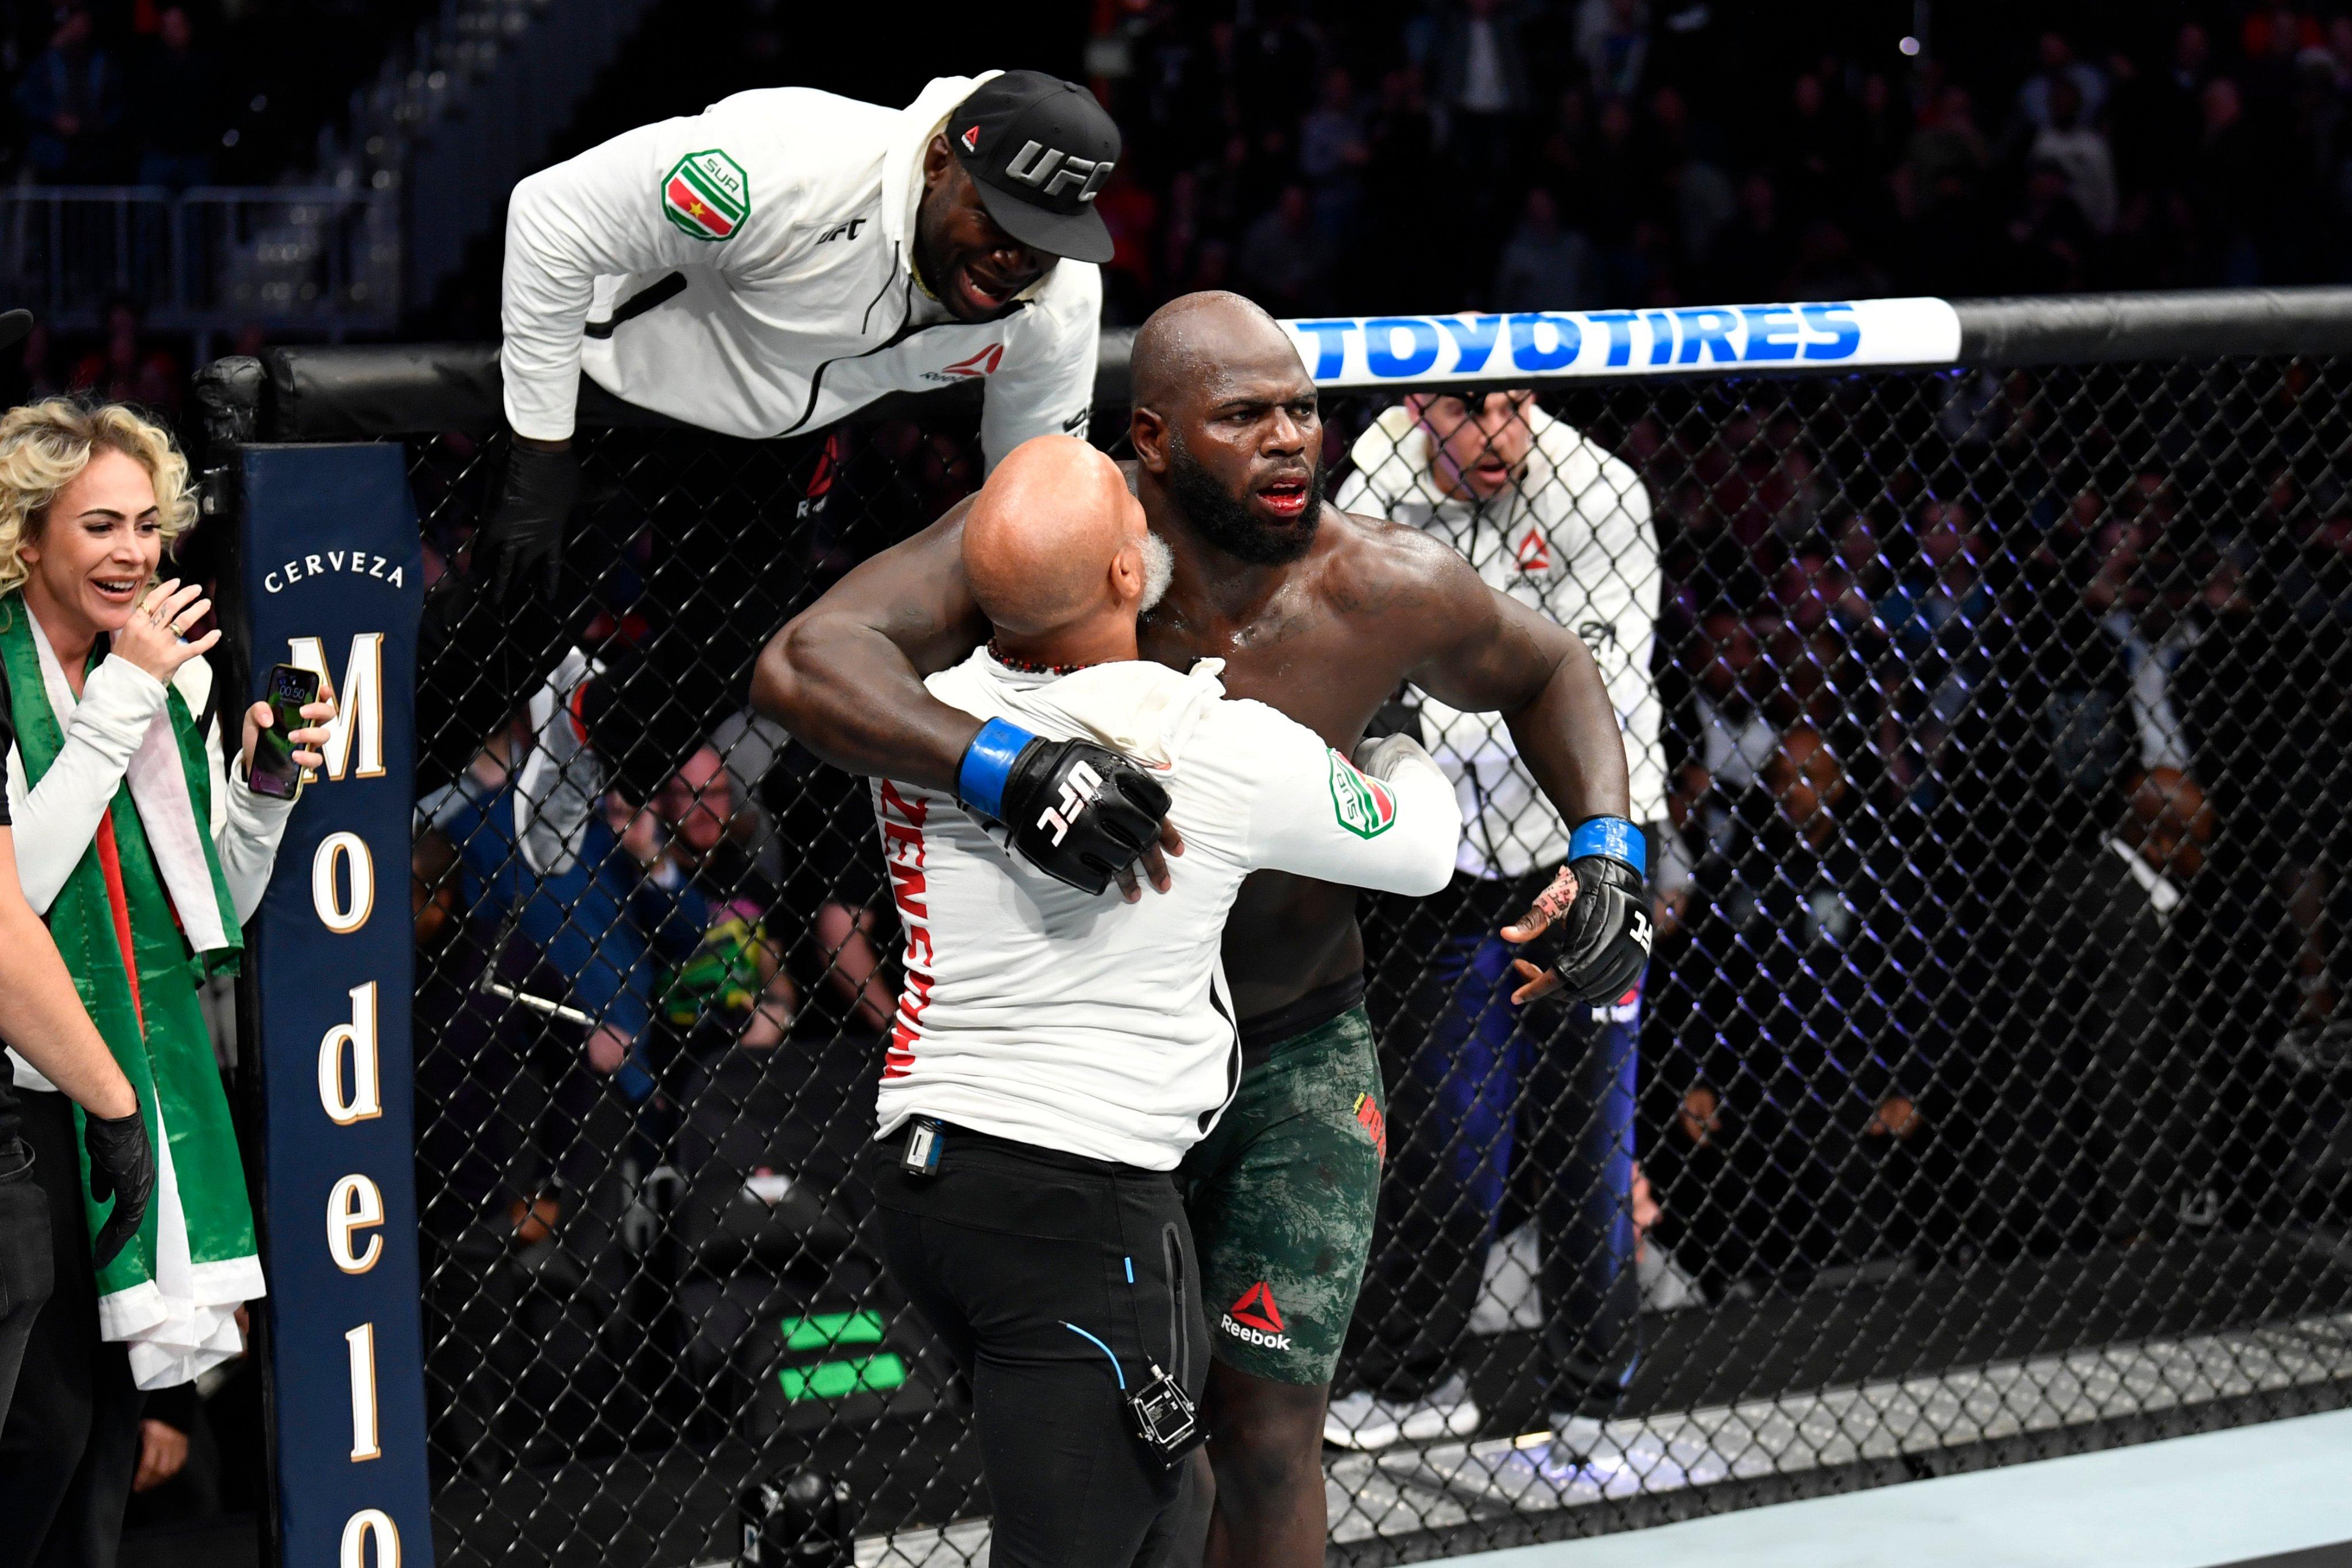 UFC Heavyweight fighter Jairzinho Rozenstruik celebrates his win over Alistair Overeem at UFC on ESPN 7